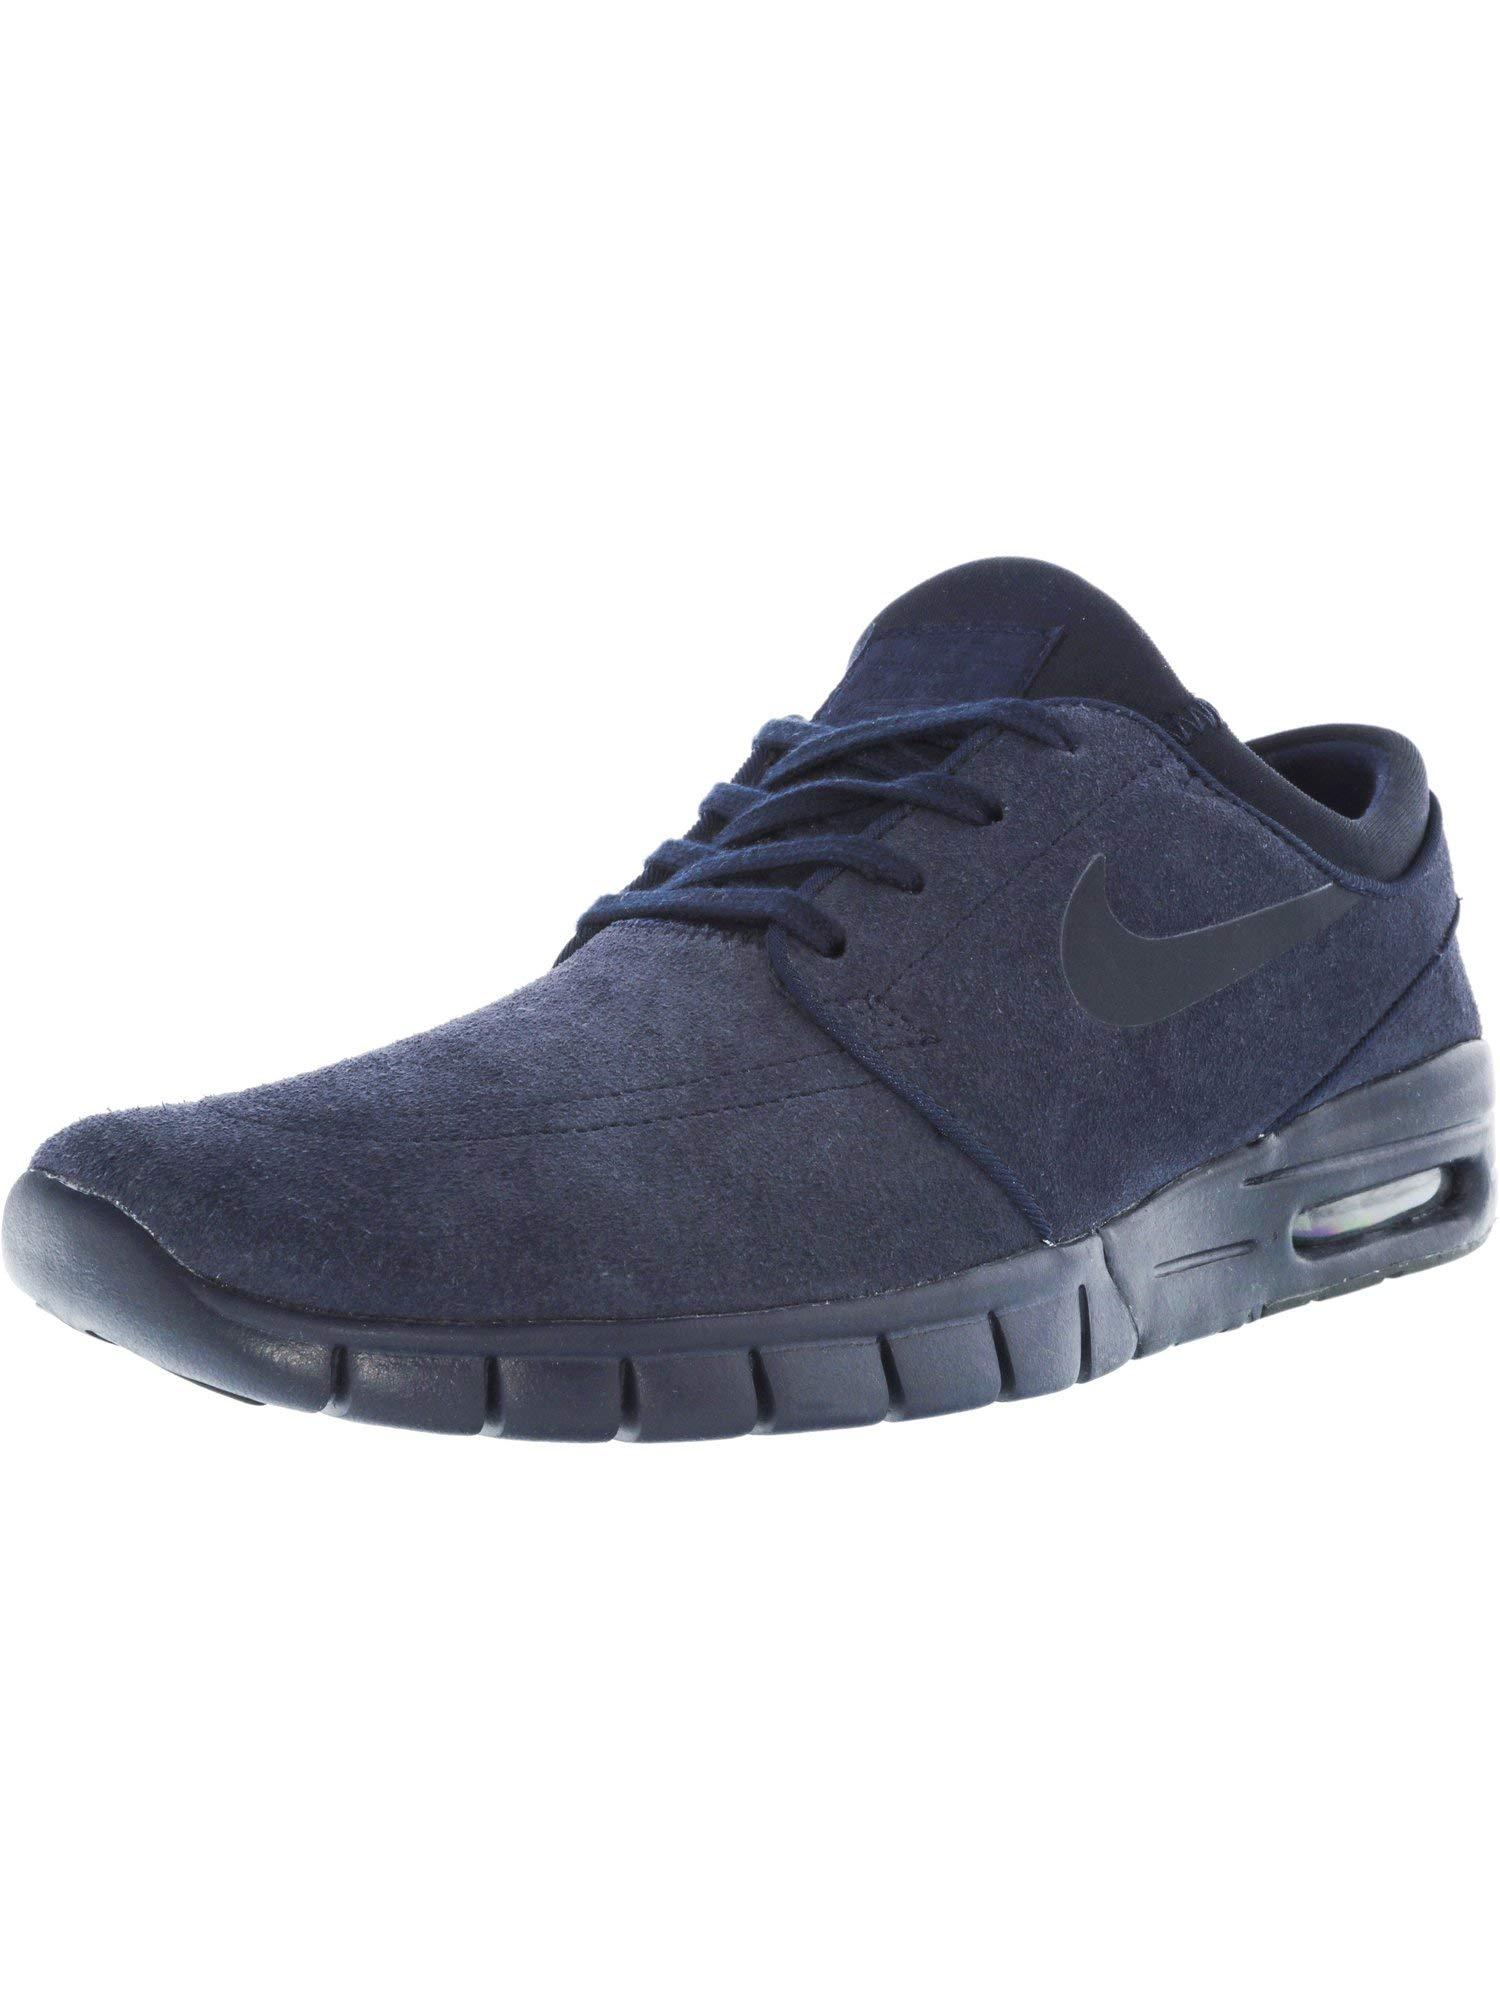 3a044f95ad Galleon - Nike Men's Stefan Janoski Max L Obsidian/Dark Obsidian Skate Shoe  (9)